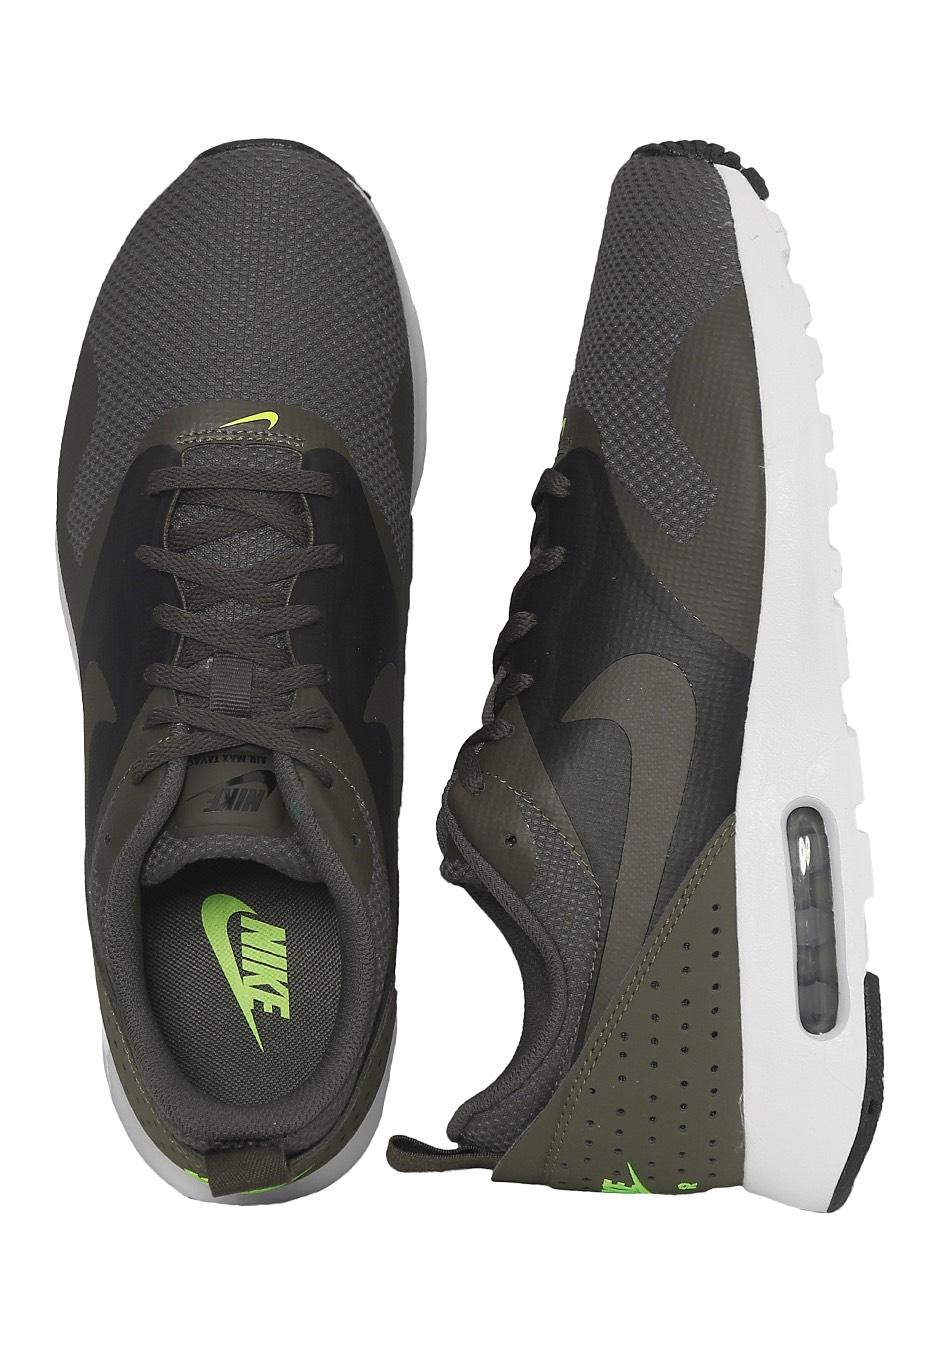 33d379fc366c Nike - Air Max Tavas SE Cargo Khaki Cargo Khaki Black - Shoes -  Impericon.com UK